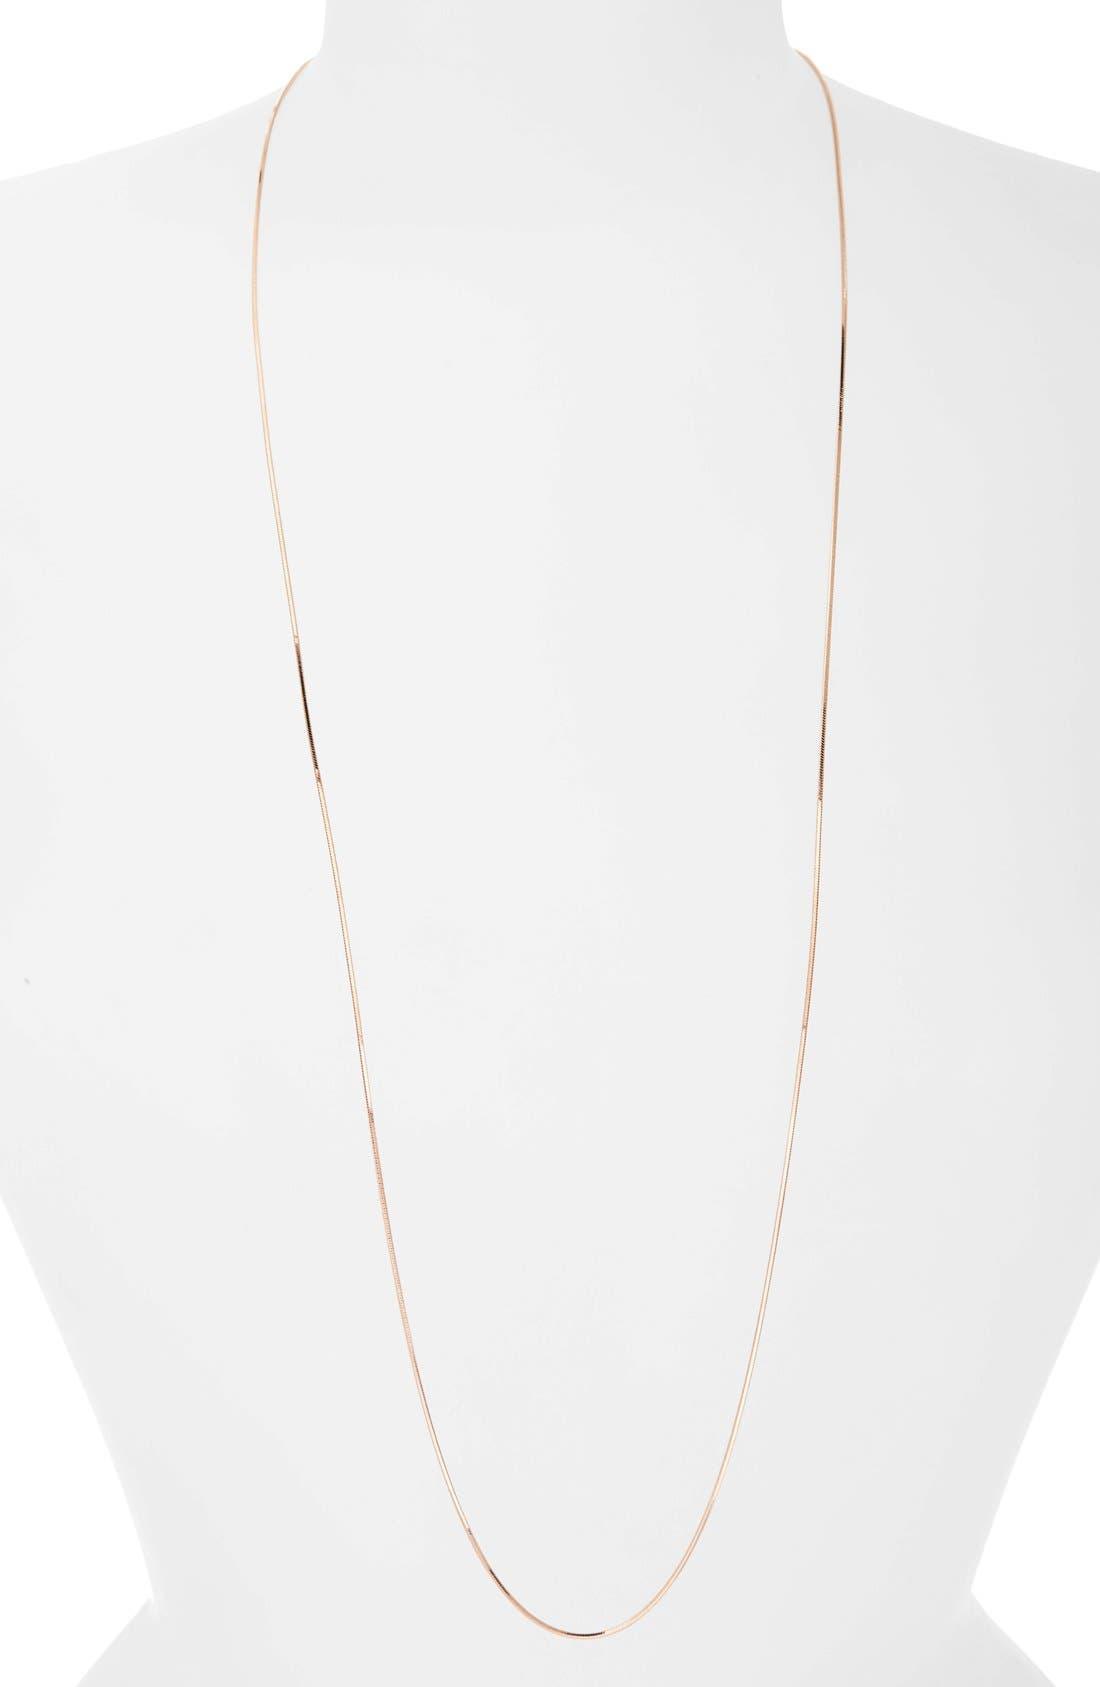 Main Image - Argento Vivo Chain Necklace